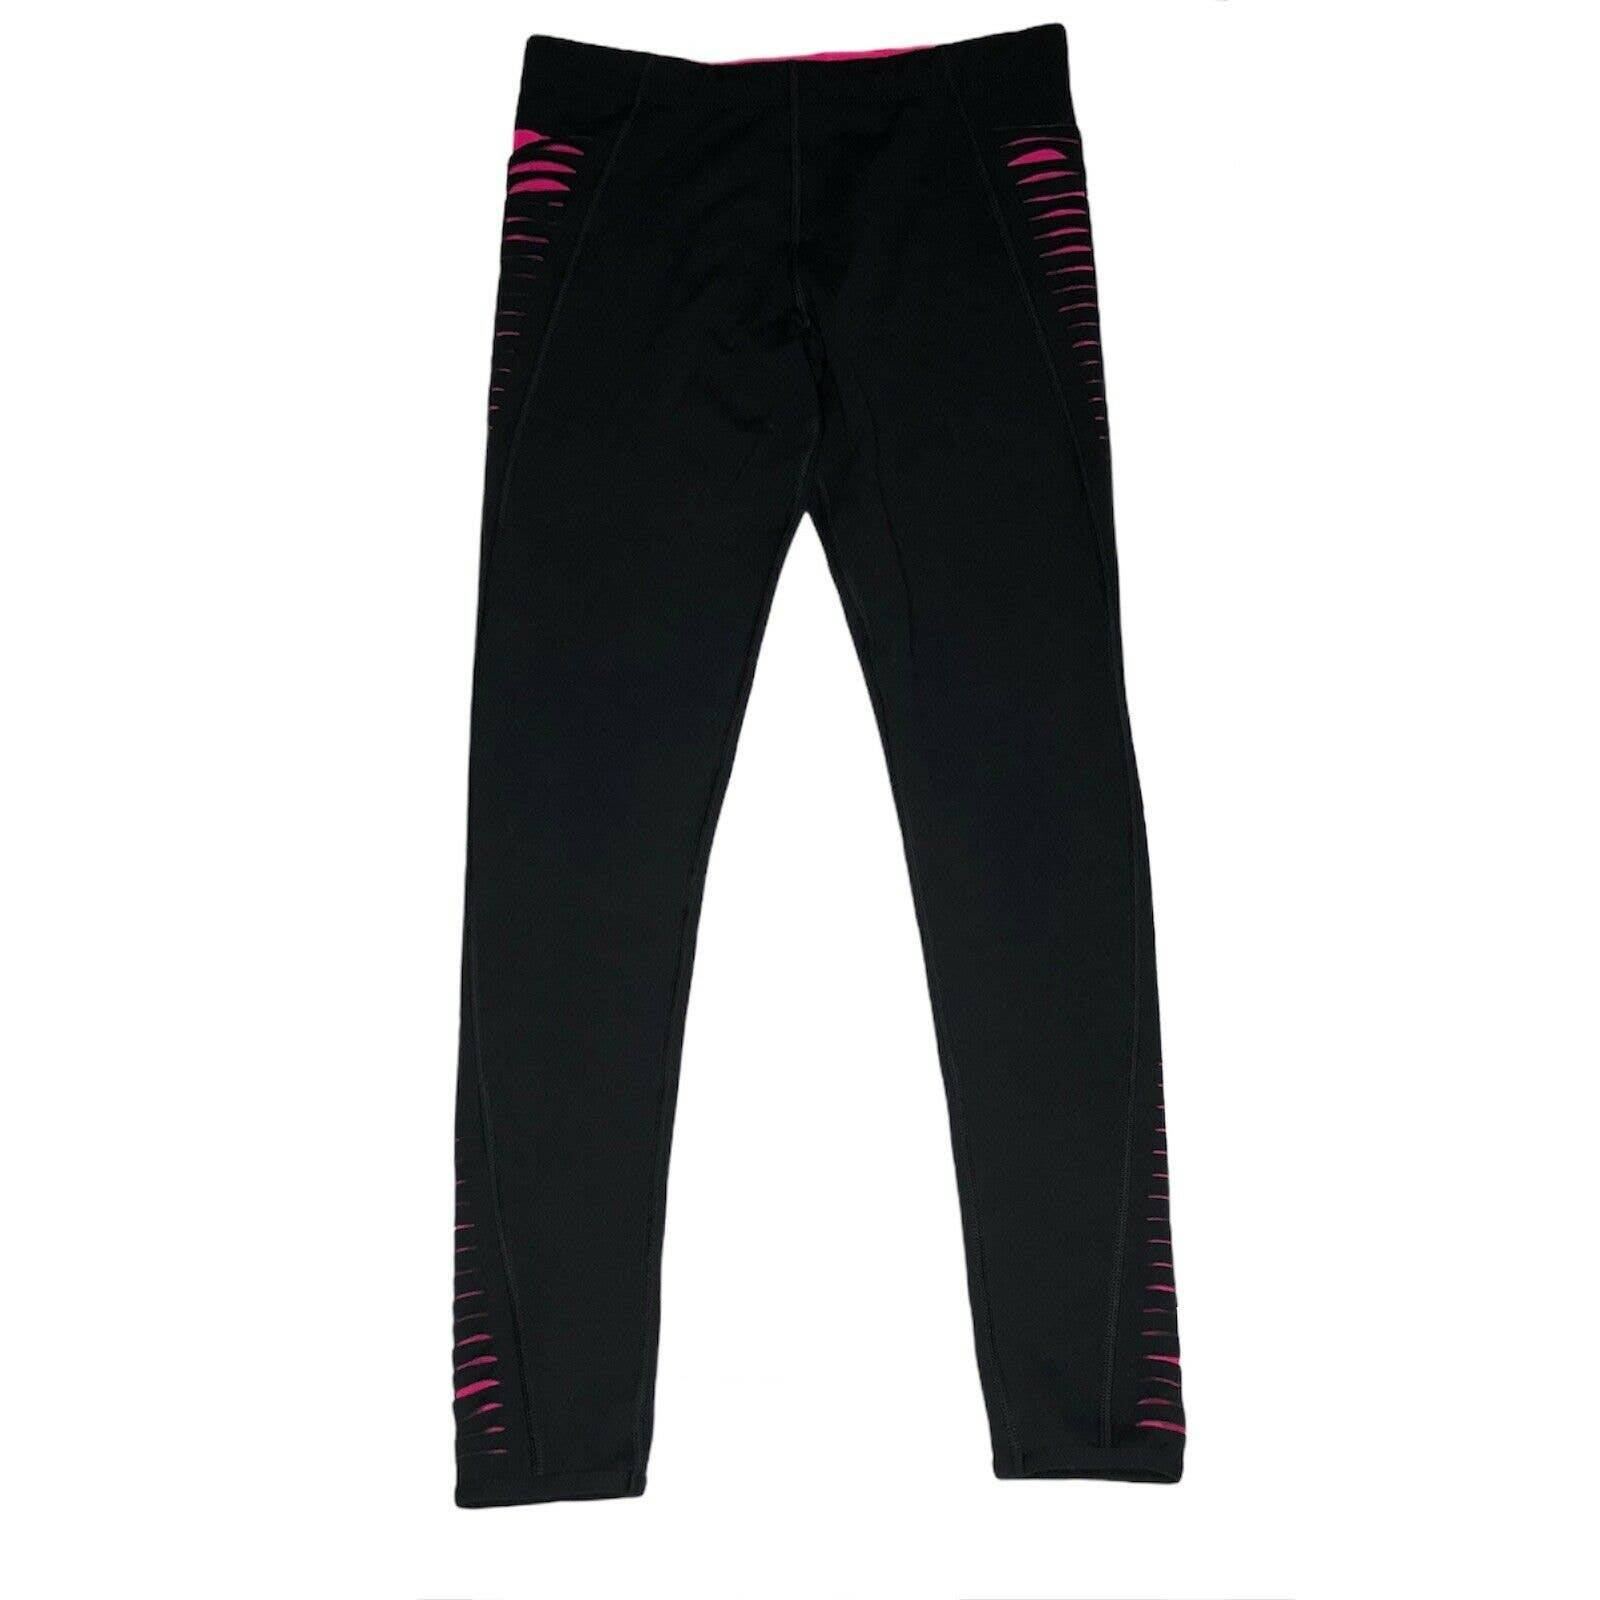 Lorna Jane Leggings Black Pink Mesh Slit